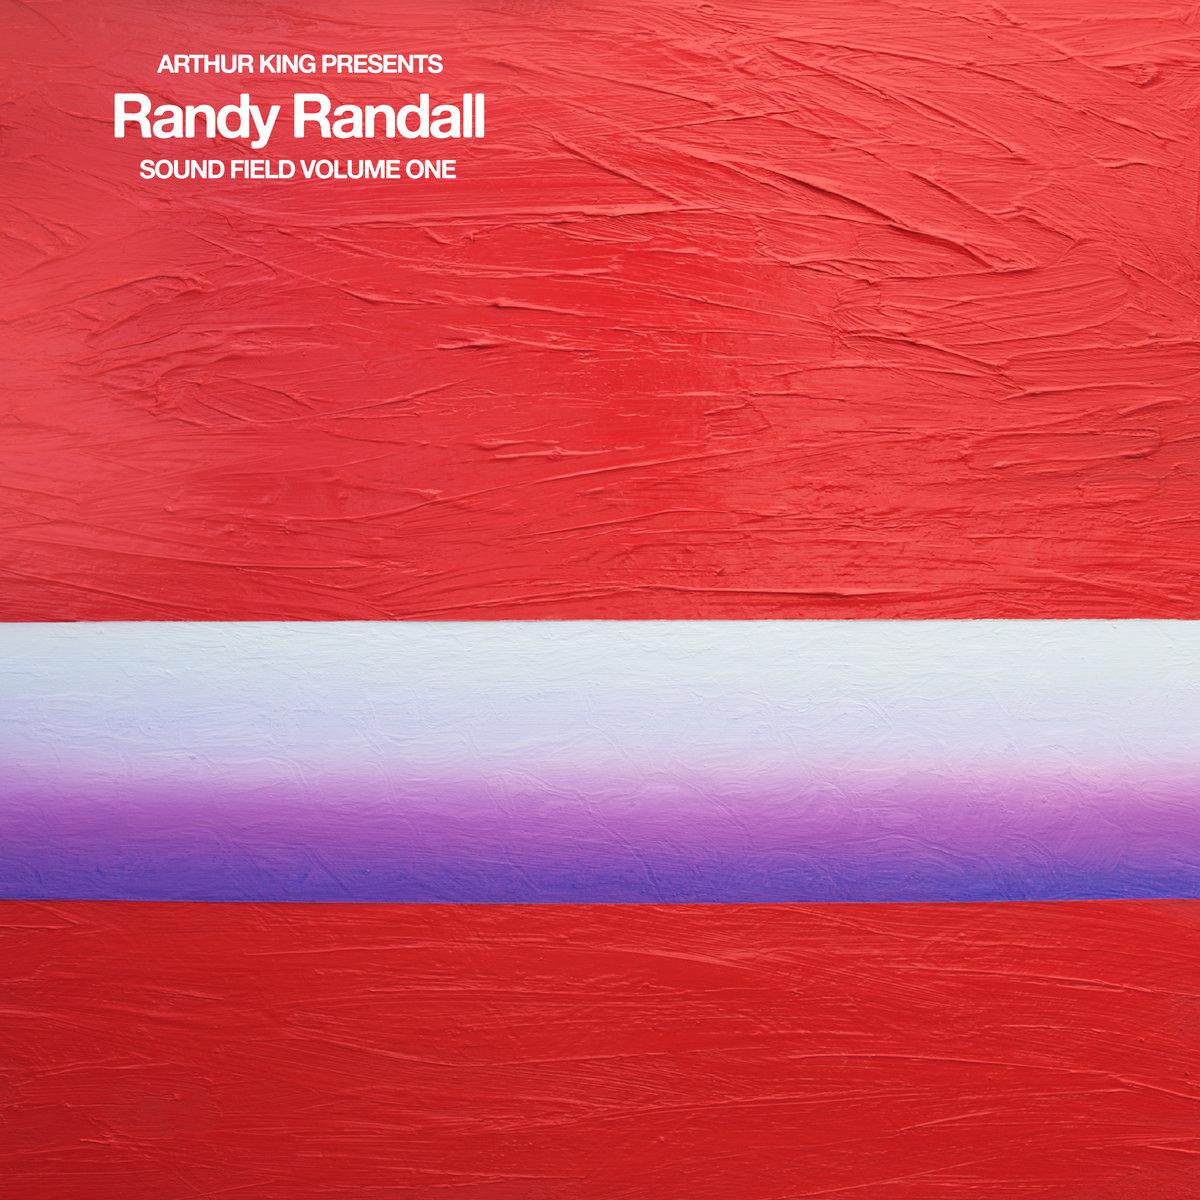 Randy Randall - Arthur King Presents Randy Randall: Sound Field Volume 1 - Digital